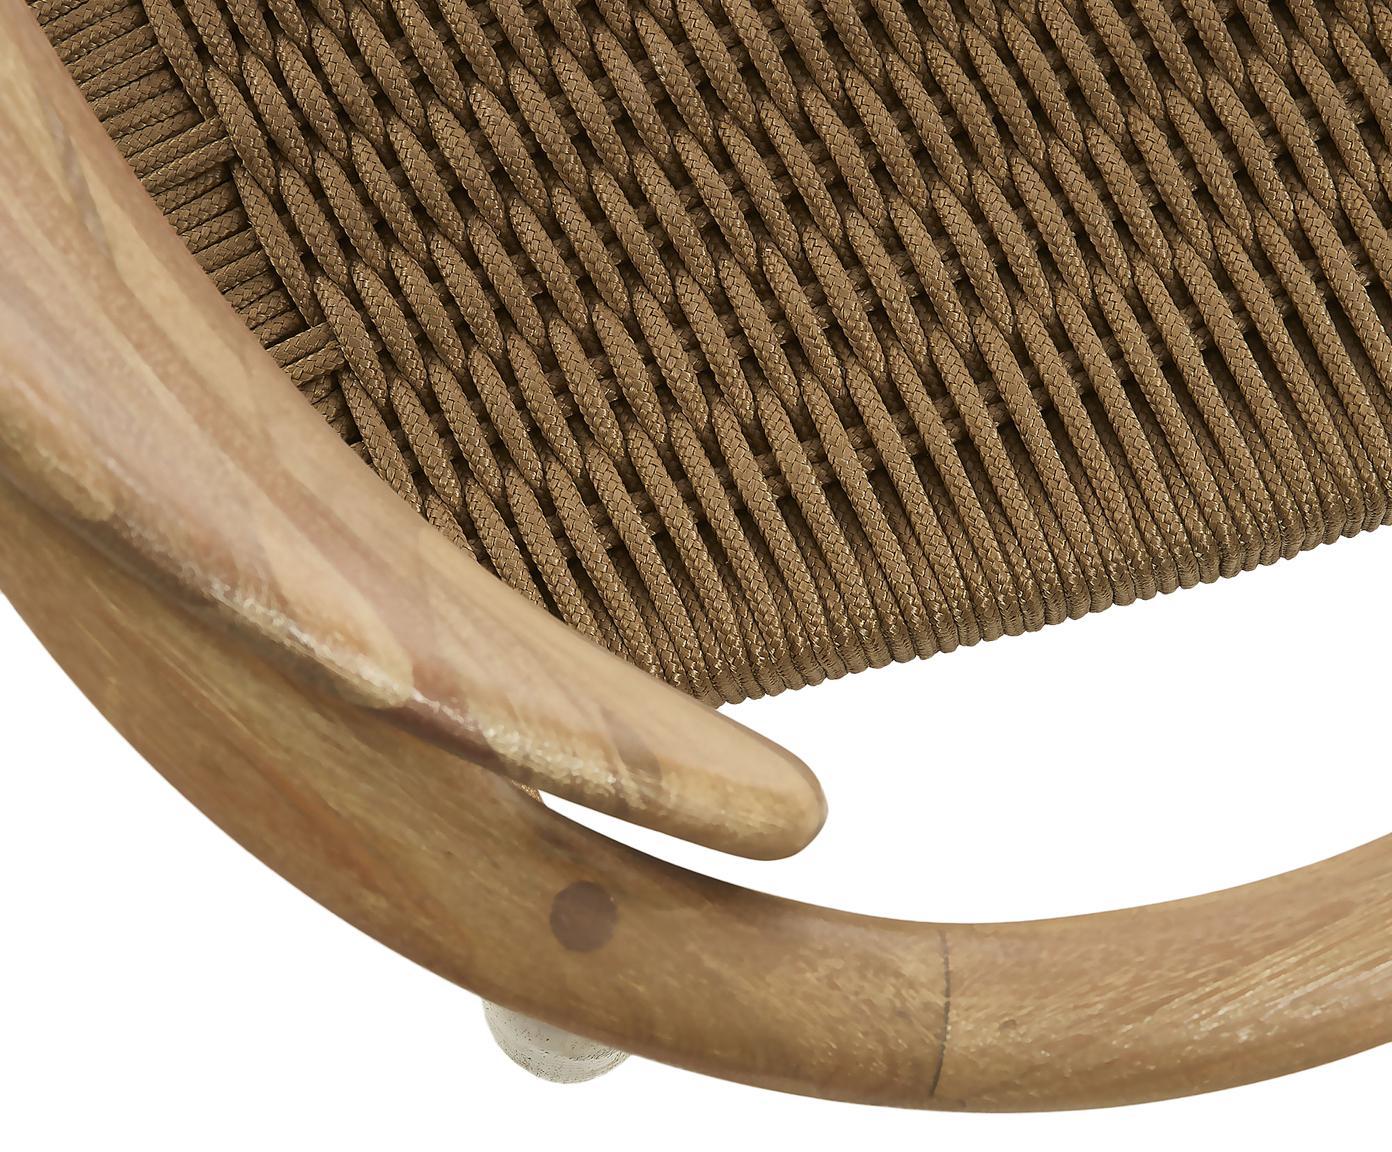 Armstoel Nina van hout, Frame: massief eucalyptushout, Zitvlak: polyestertouw, Beige, eucalyptushoutkleurig, 56 x 53 cm